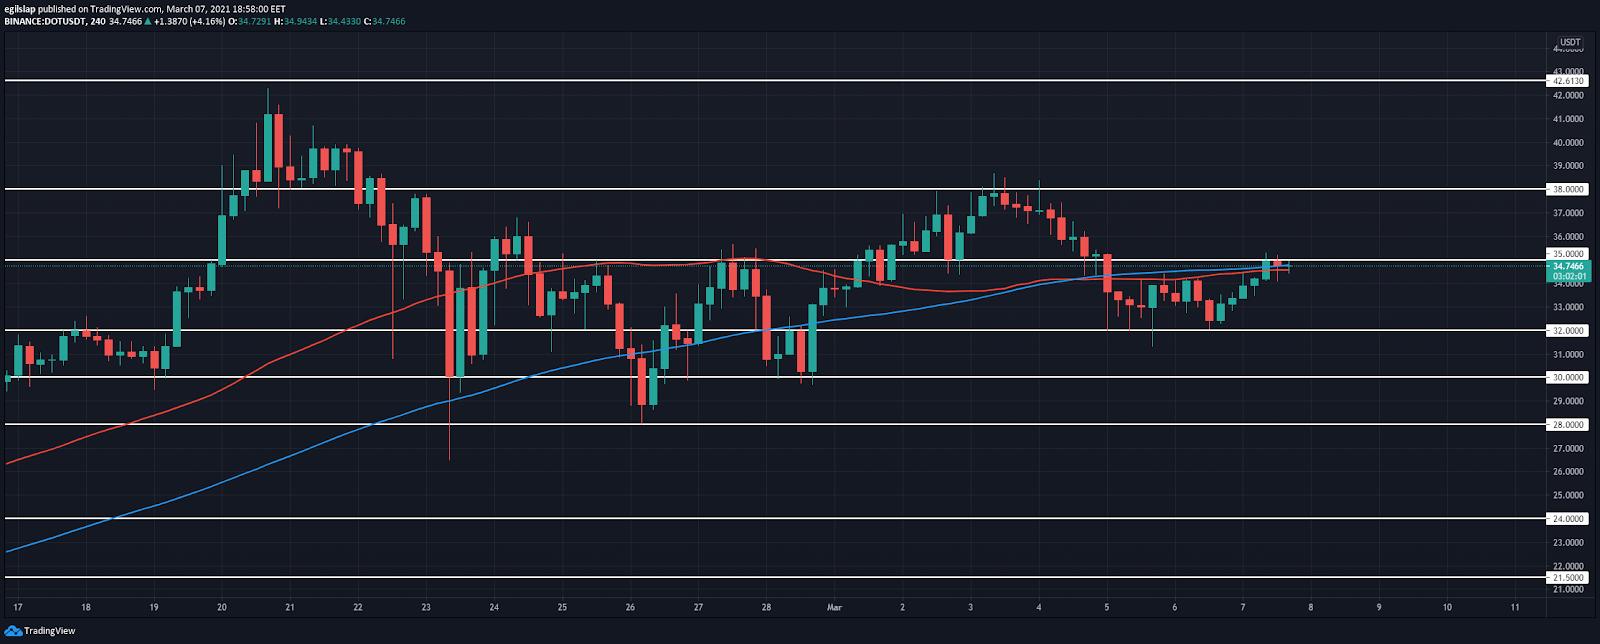 Weekly Crypto Price Analysis 7th Mar: BTC, ETH, XRP, DOT, SUSHI 5